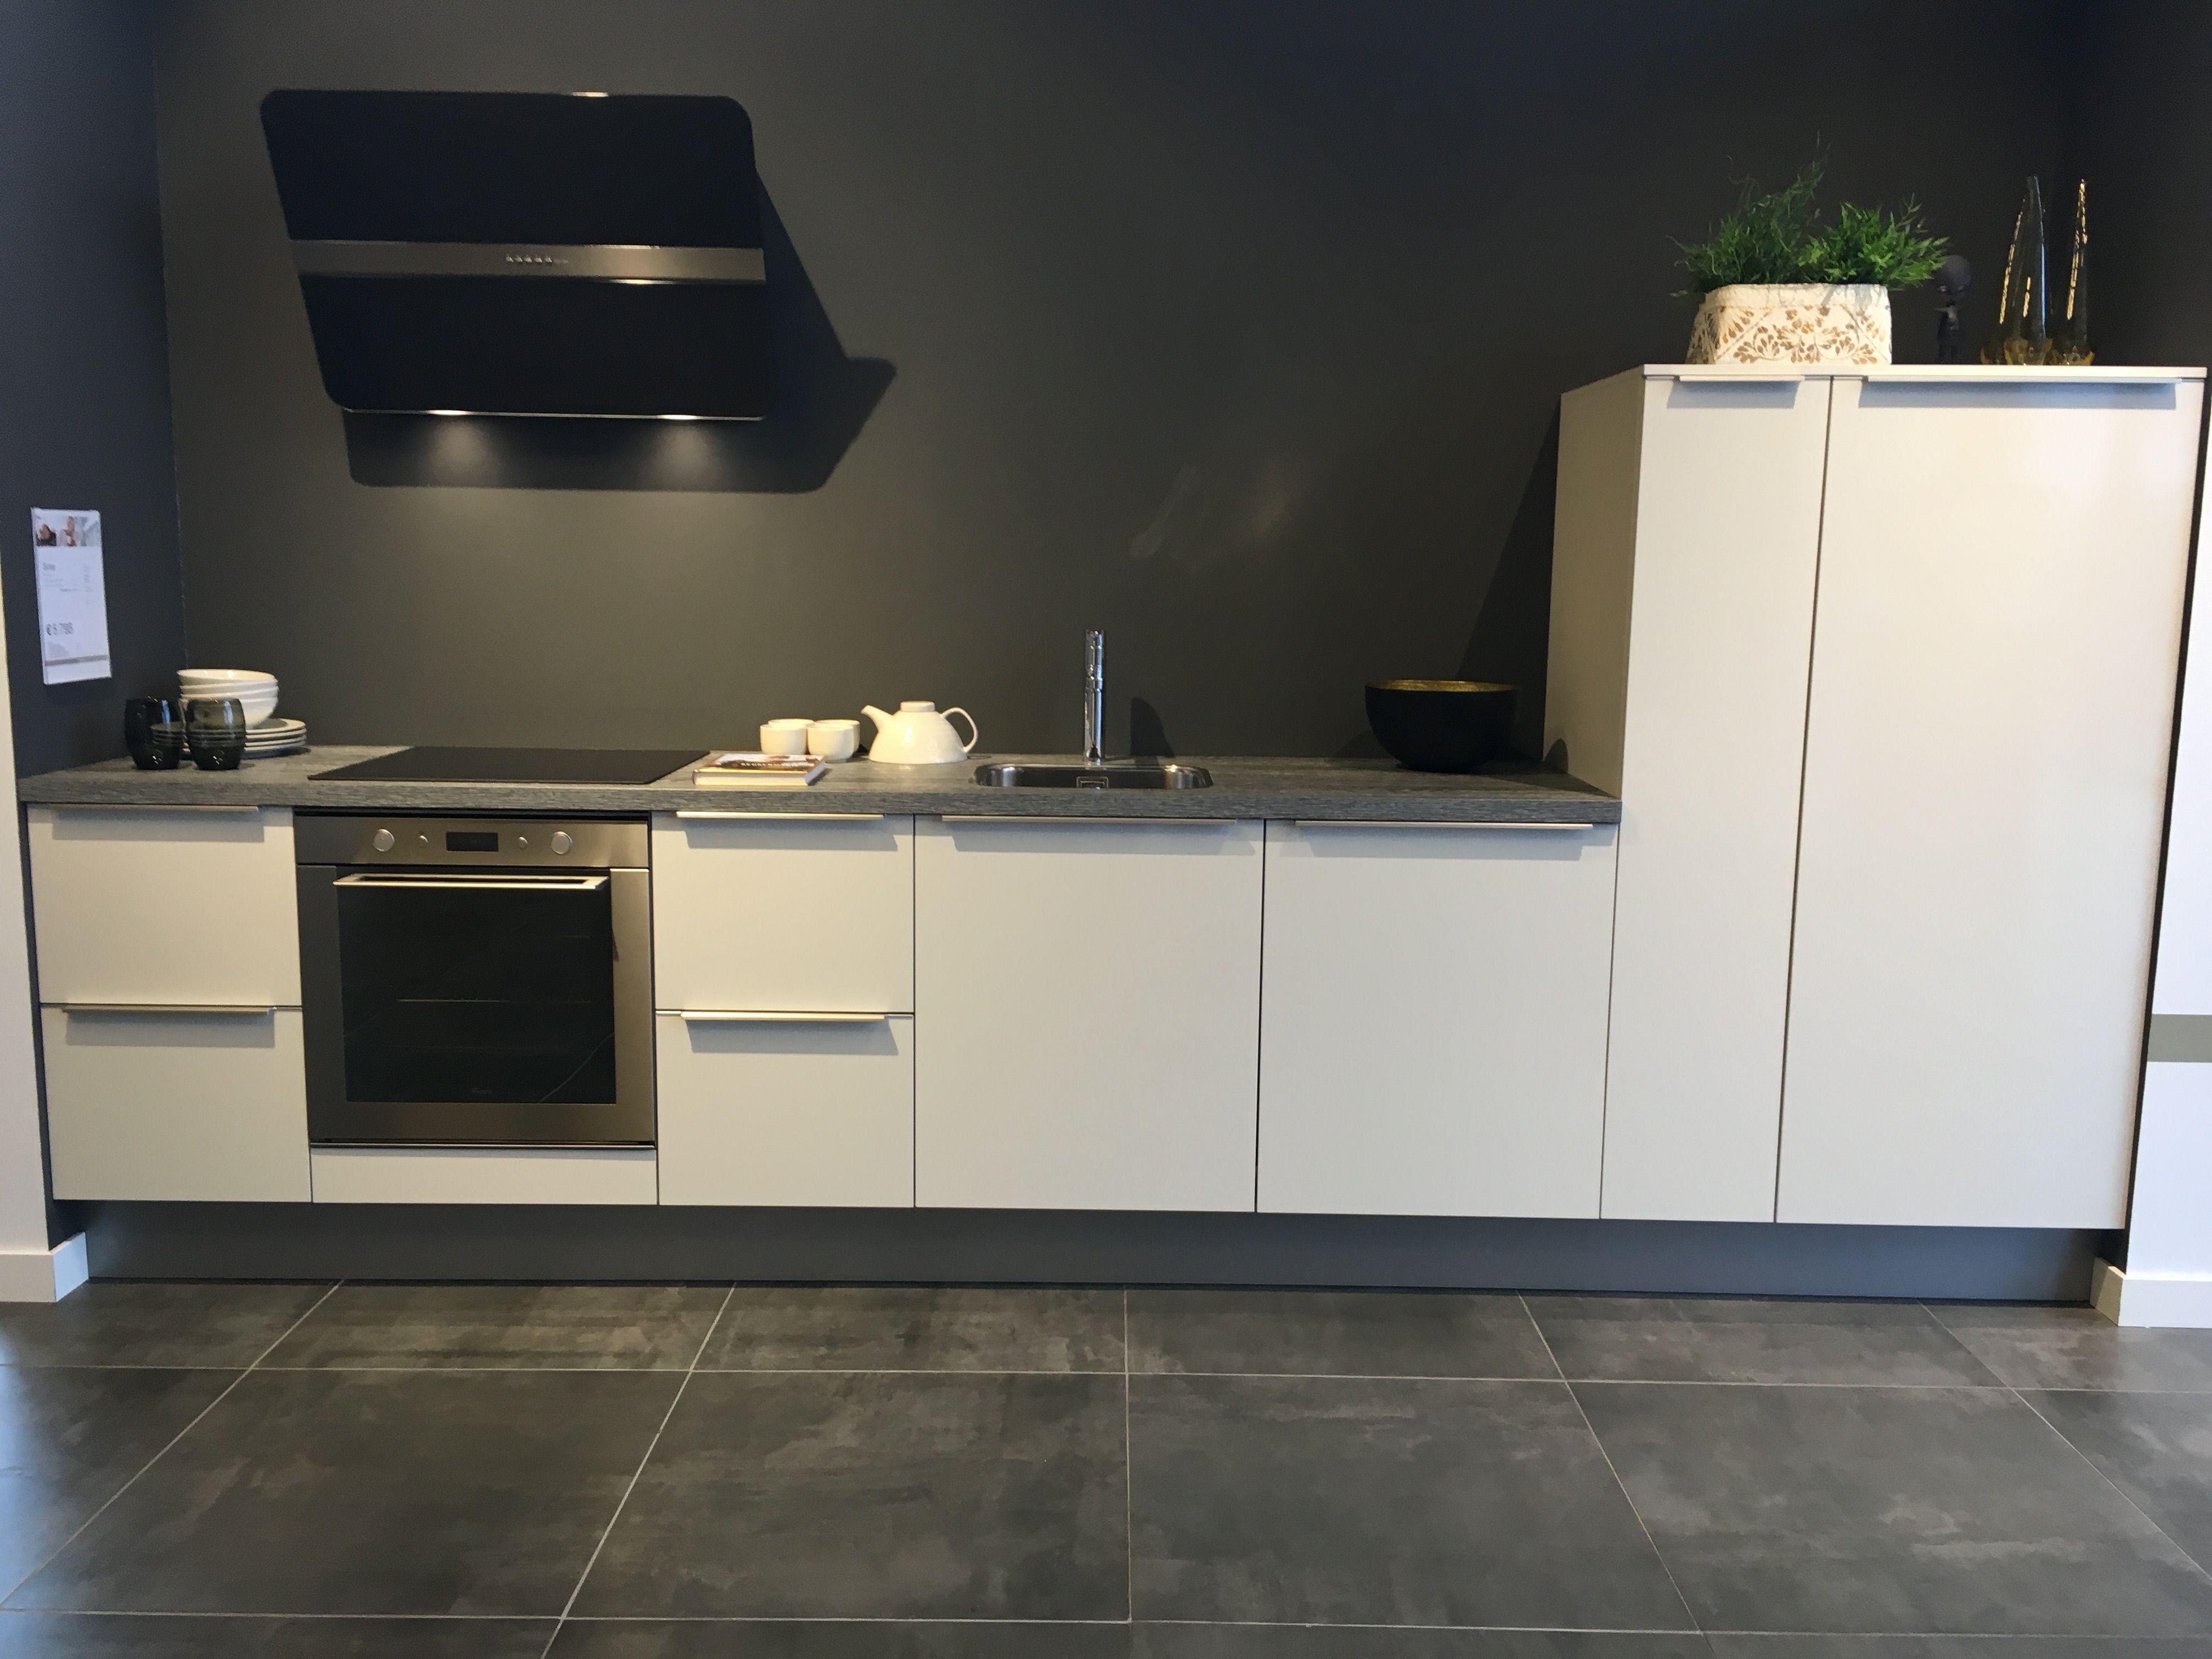 Goedkope Rechte Keukens : Moderne rechte keuken rechte keukens